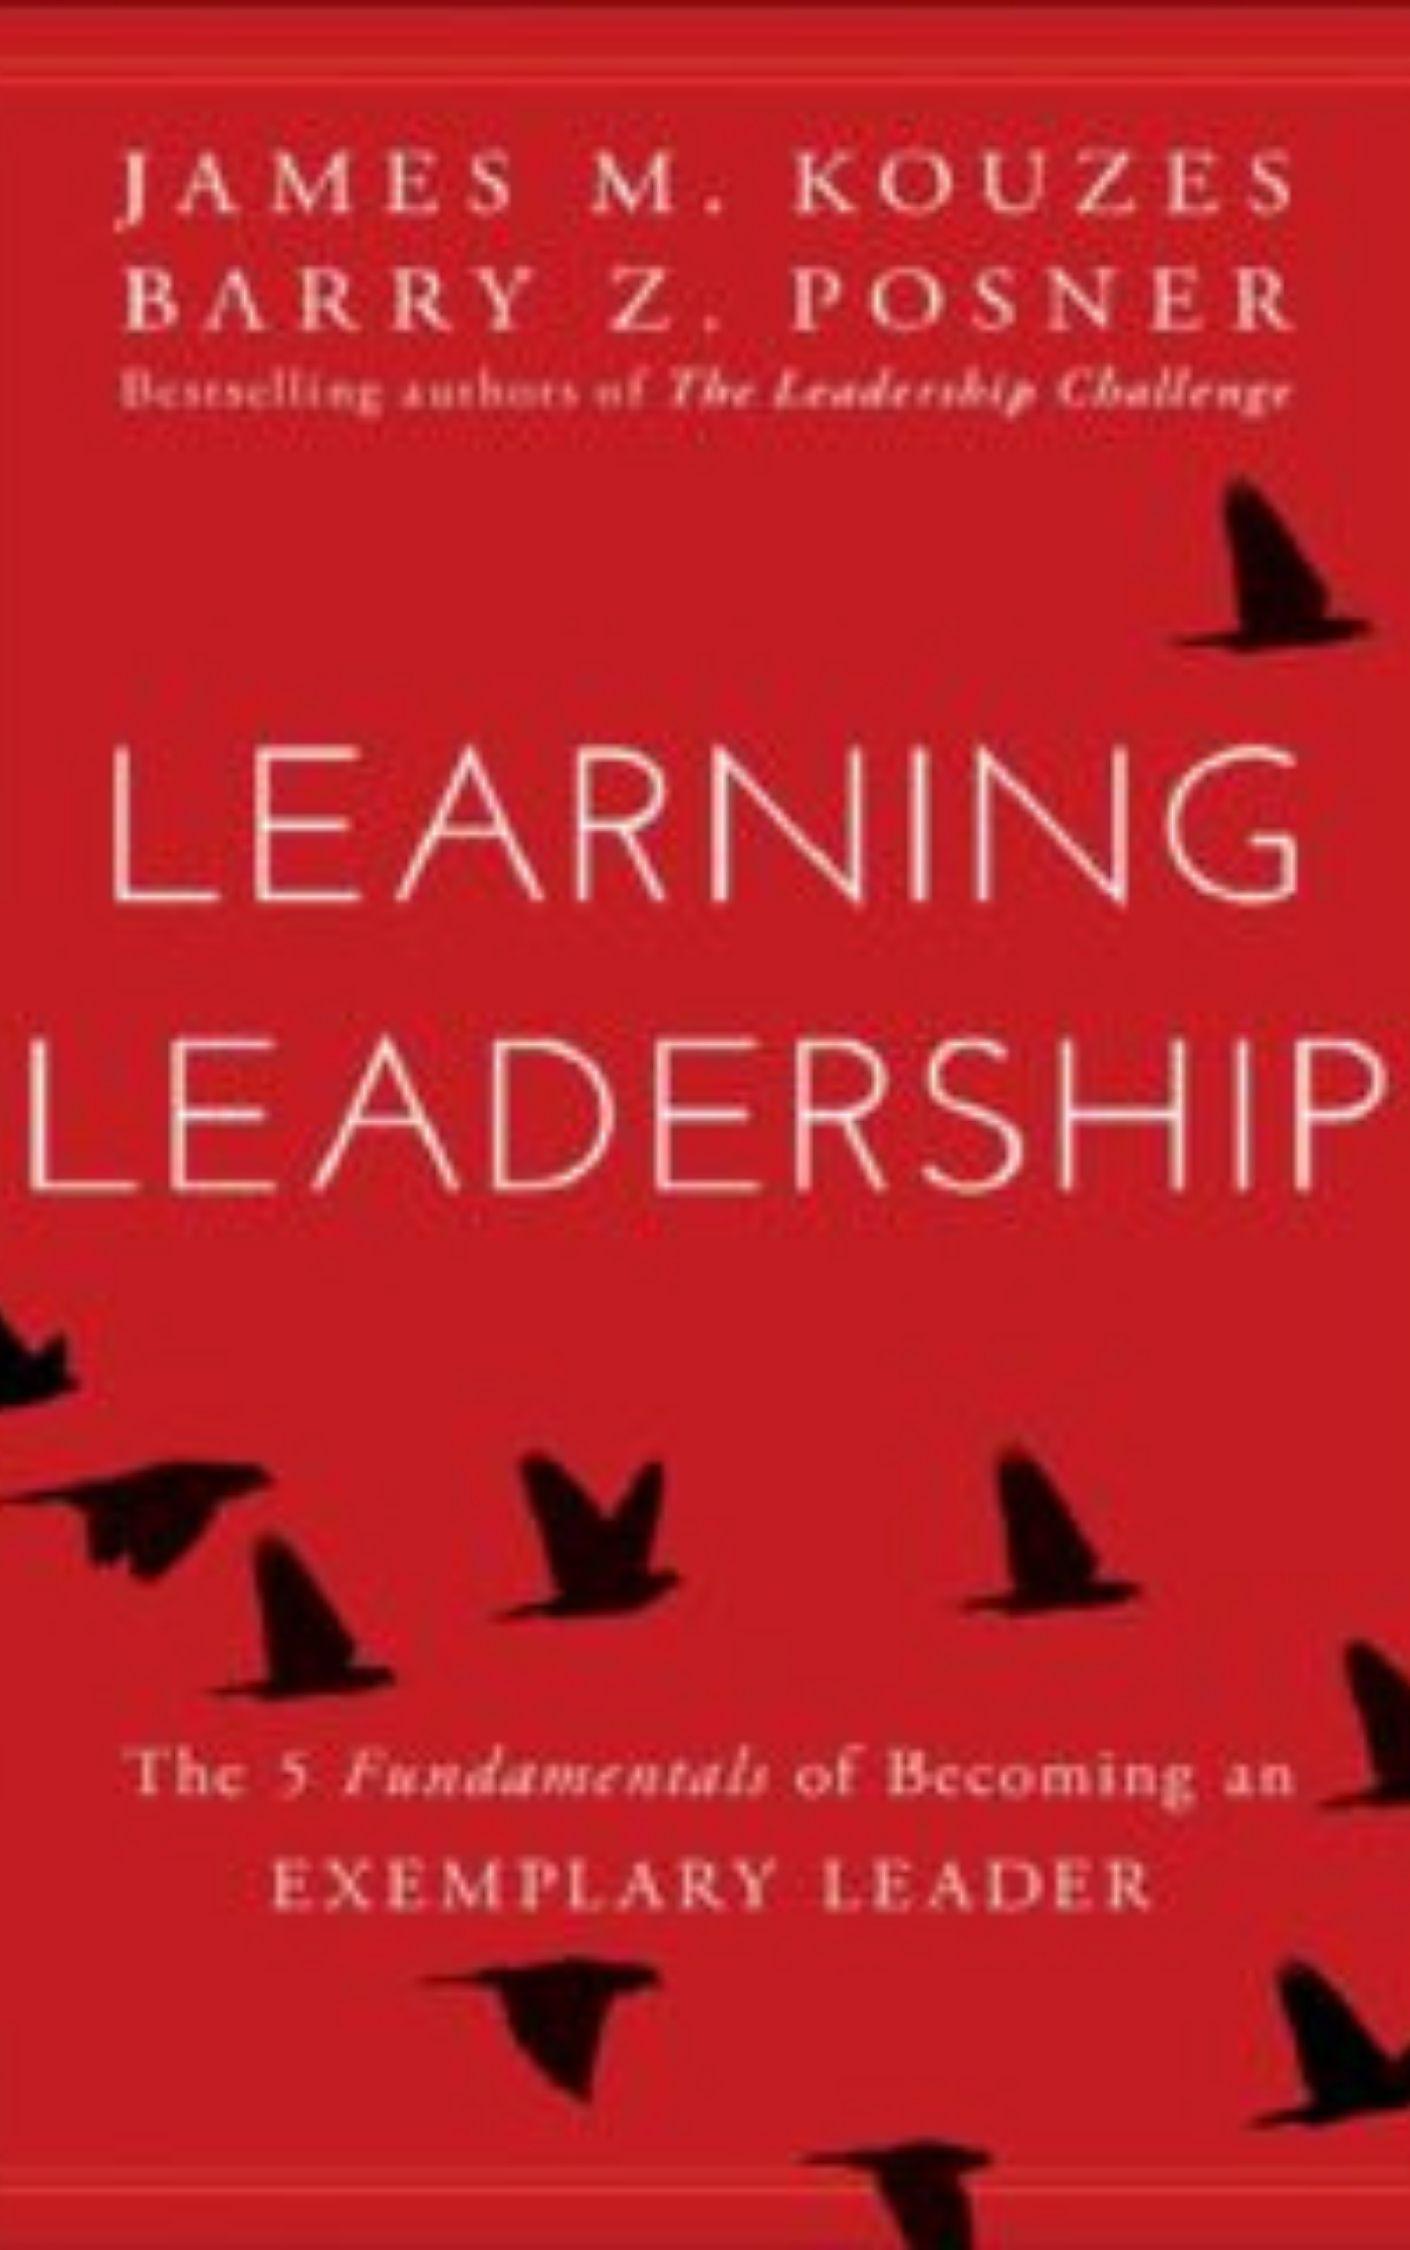 Learning Leadership by James M. Kouzes & Barry Z. Posner